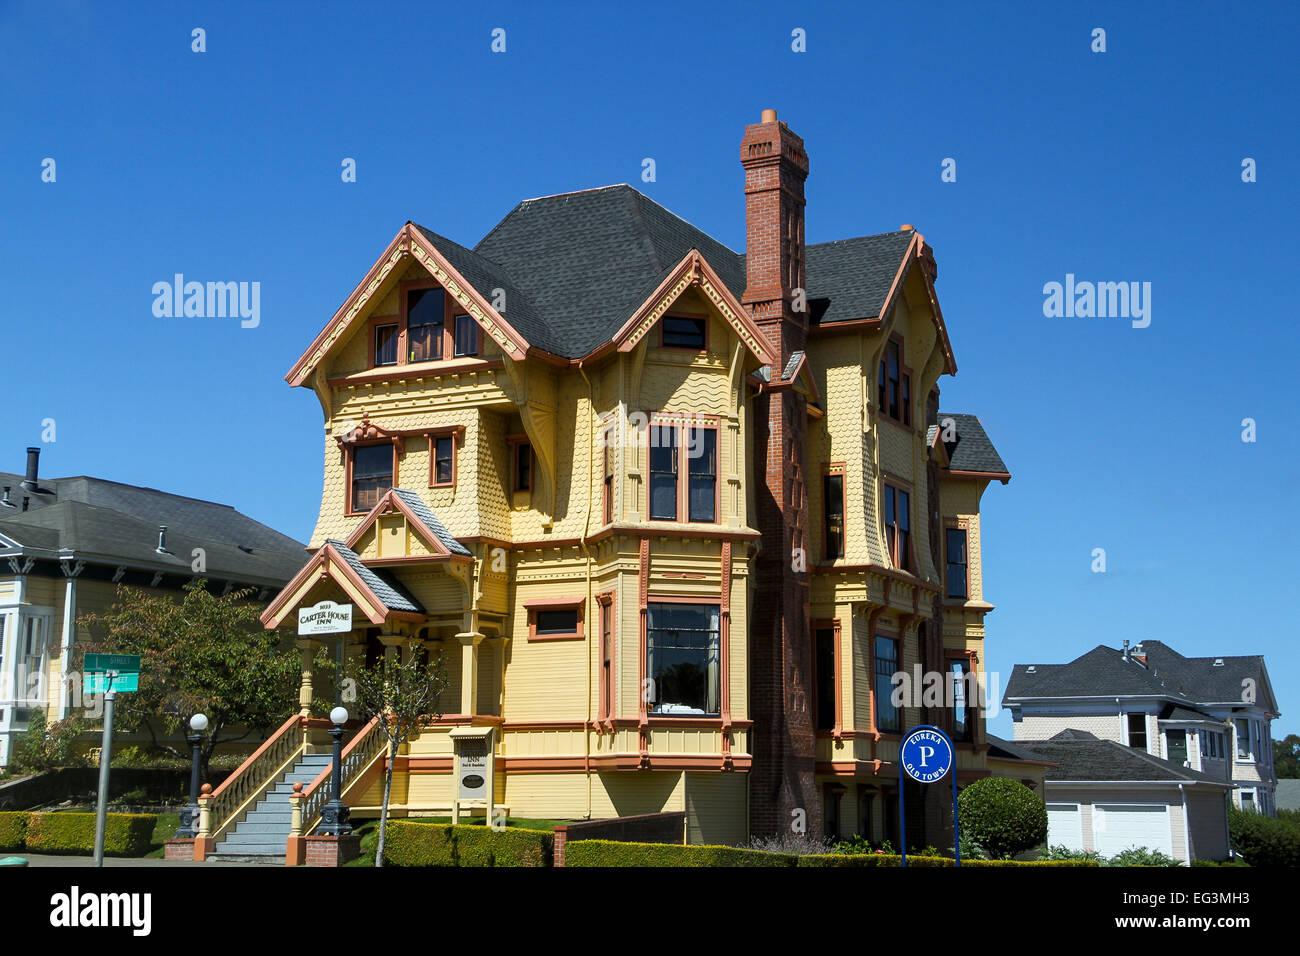 The Carter House Inn, Eureka, California - Stock Image